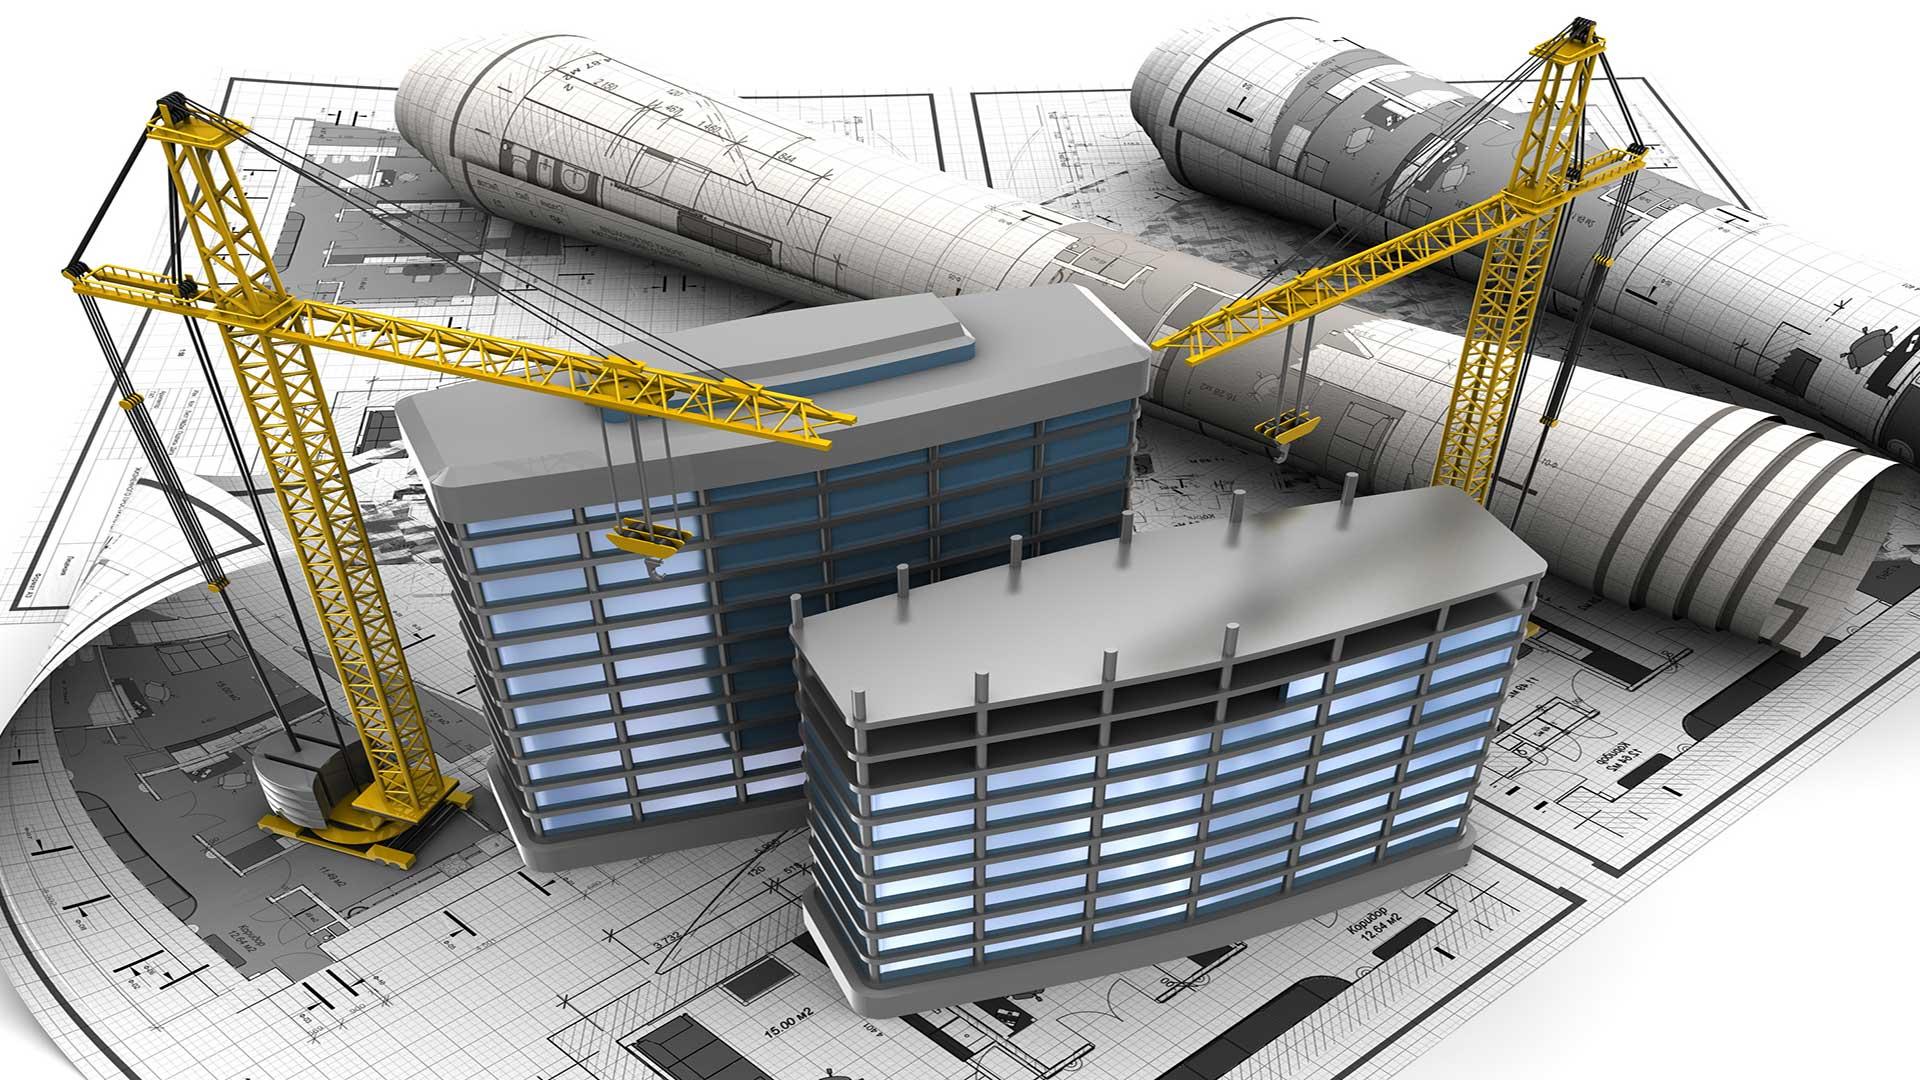 Строительство от проекта до сдачи в эксплуатацию